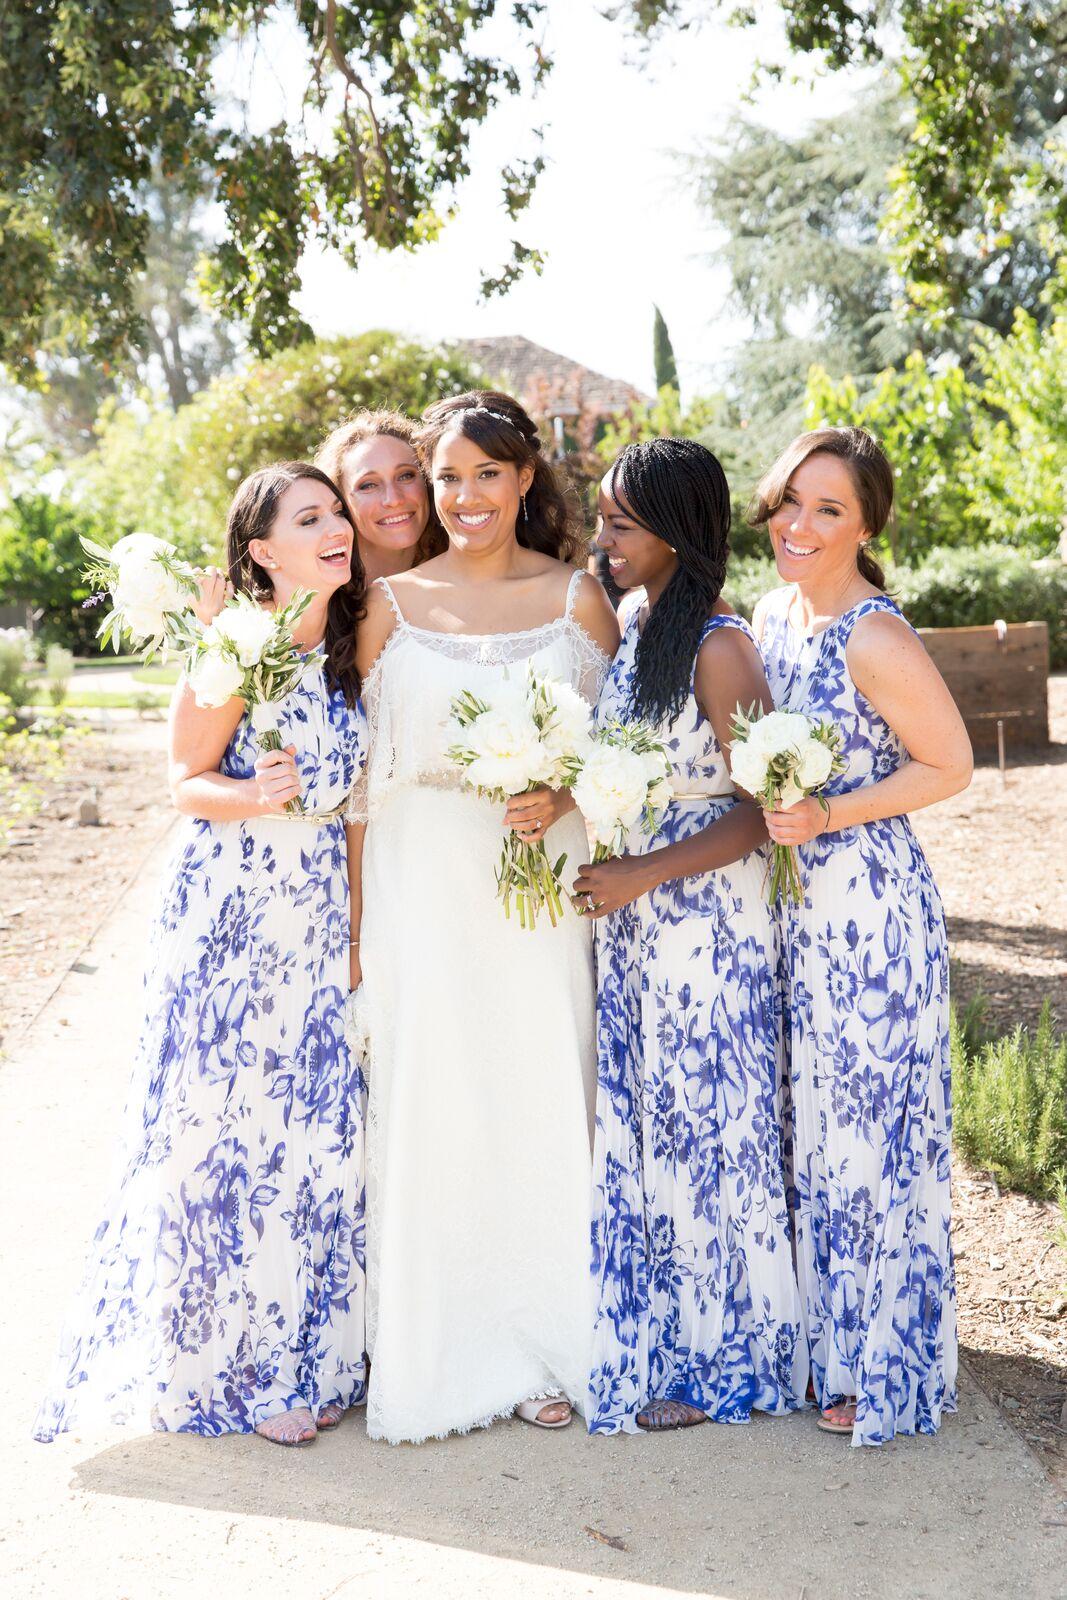 bohemian-lace-wedding-dress-2.jpg